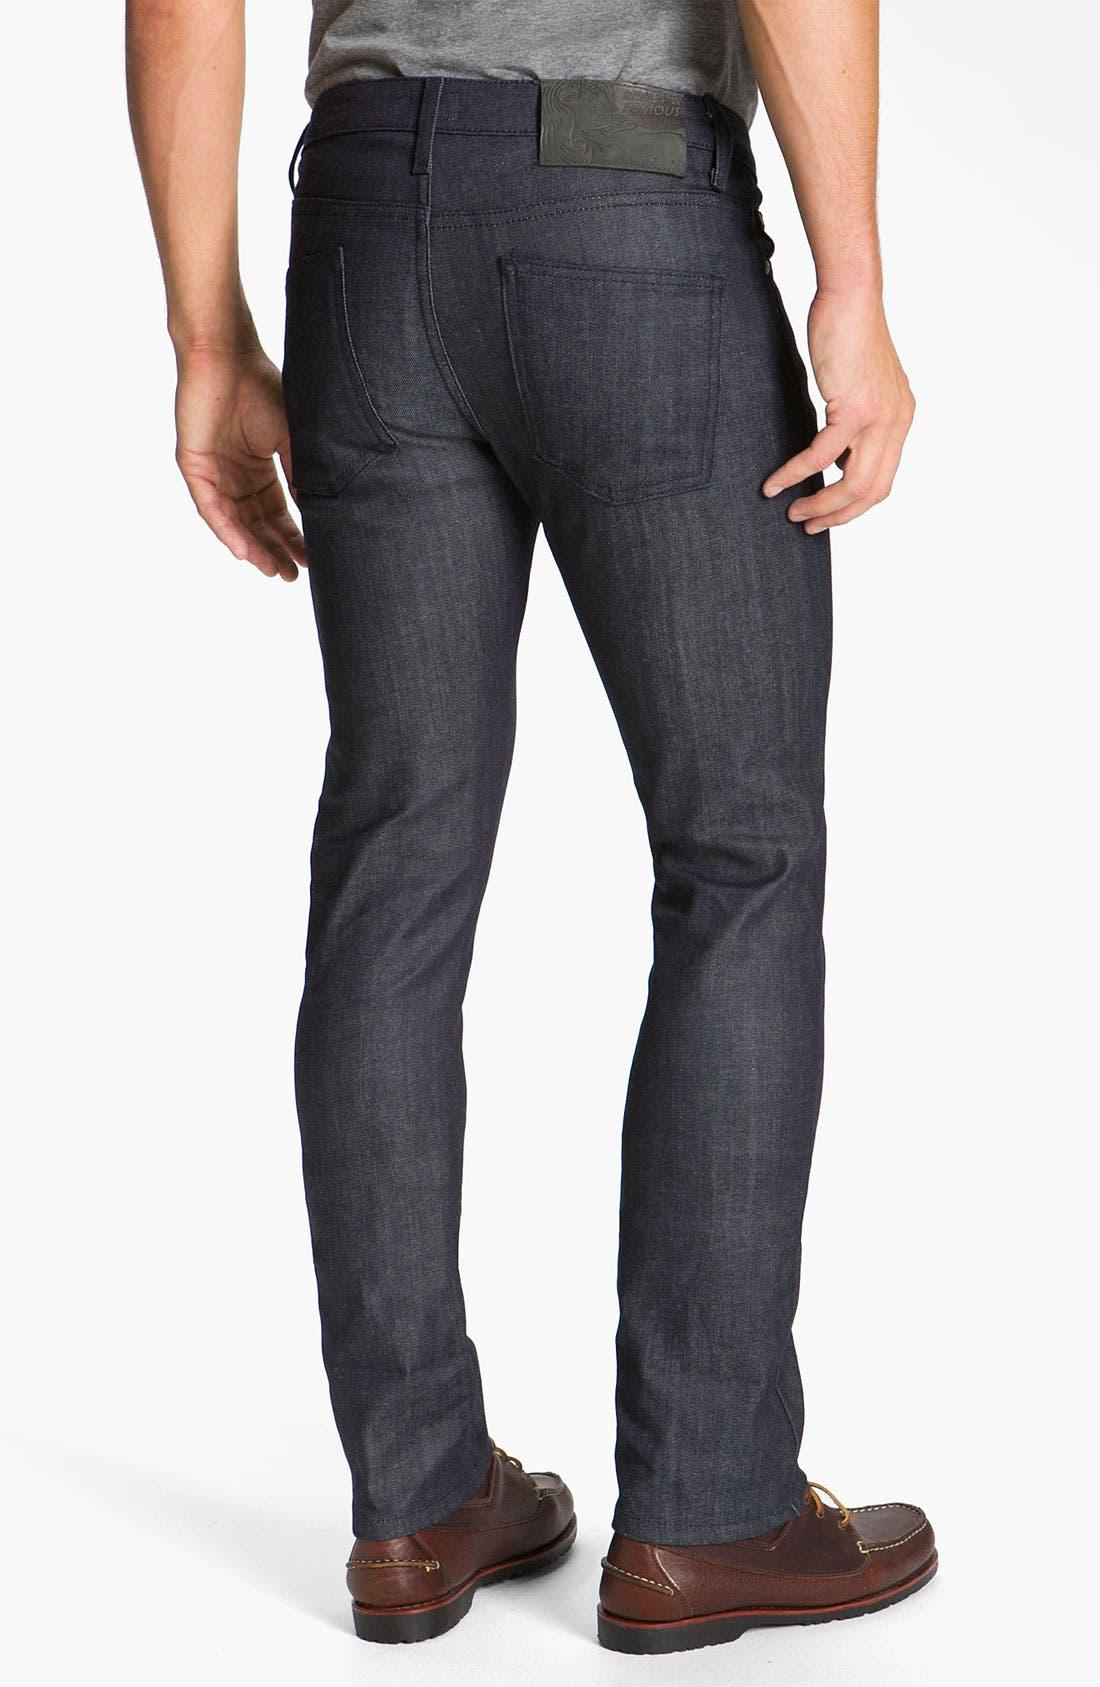 Alternate Image 1 Selected - Naked & Famous Denim 'Skinny Guy' Slim Cotton Cashmere Skinny Leg Jeans (Dark Indigo)